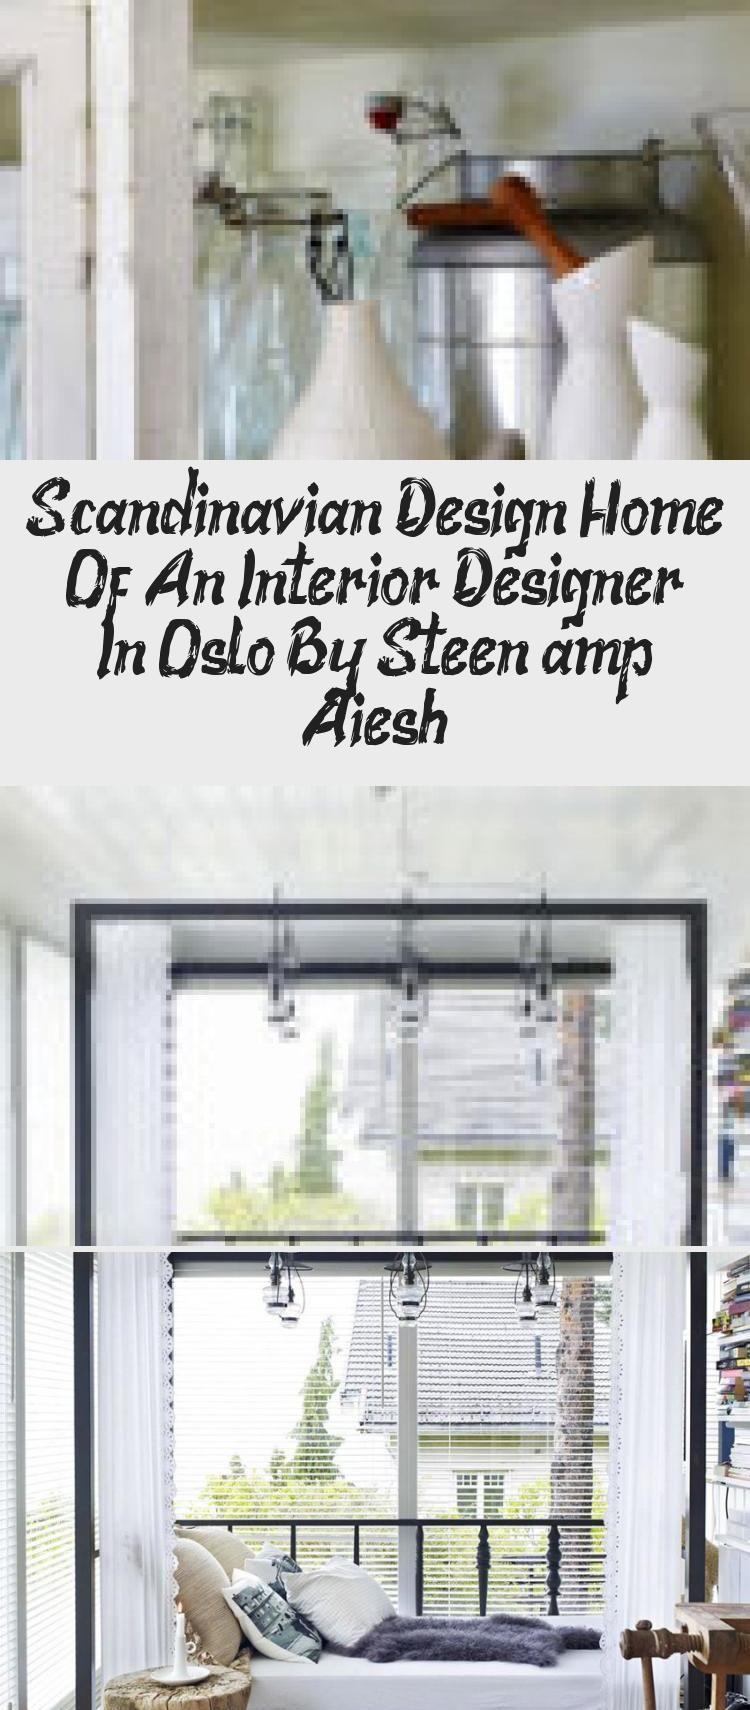 Home of an Interior Designer in Oslo by Steen & Aiesh (17) #interiordesignInspiration #interiordesignIdeas #interiordesignStudio #Traditionalinteriordesign #interiordesignBusiness